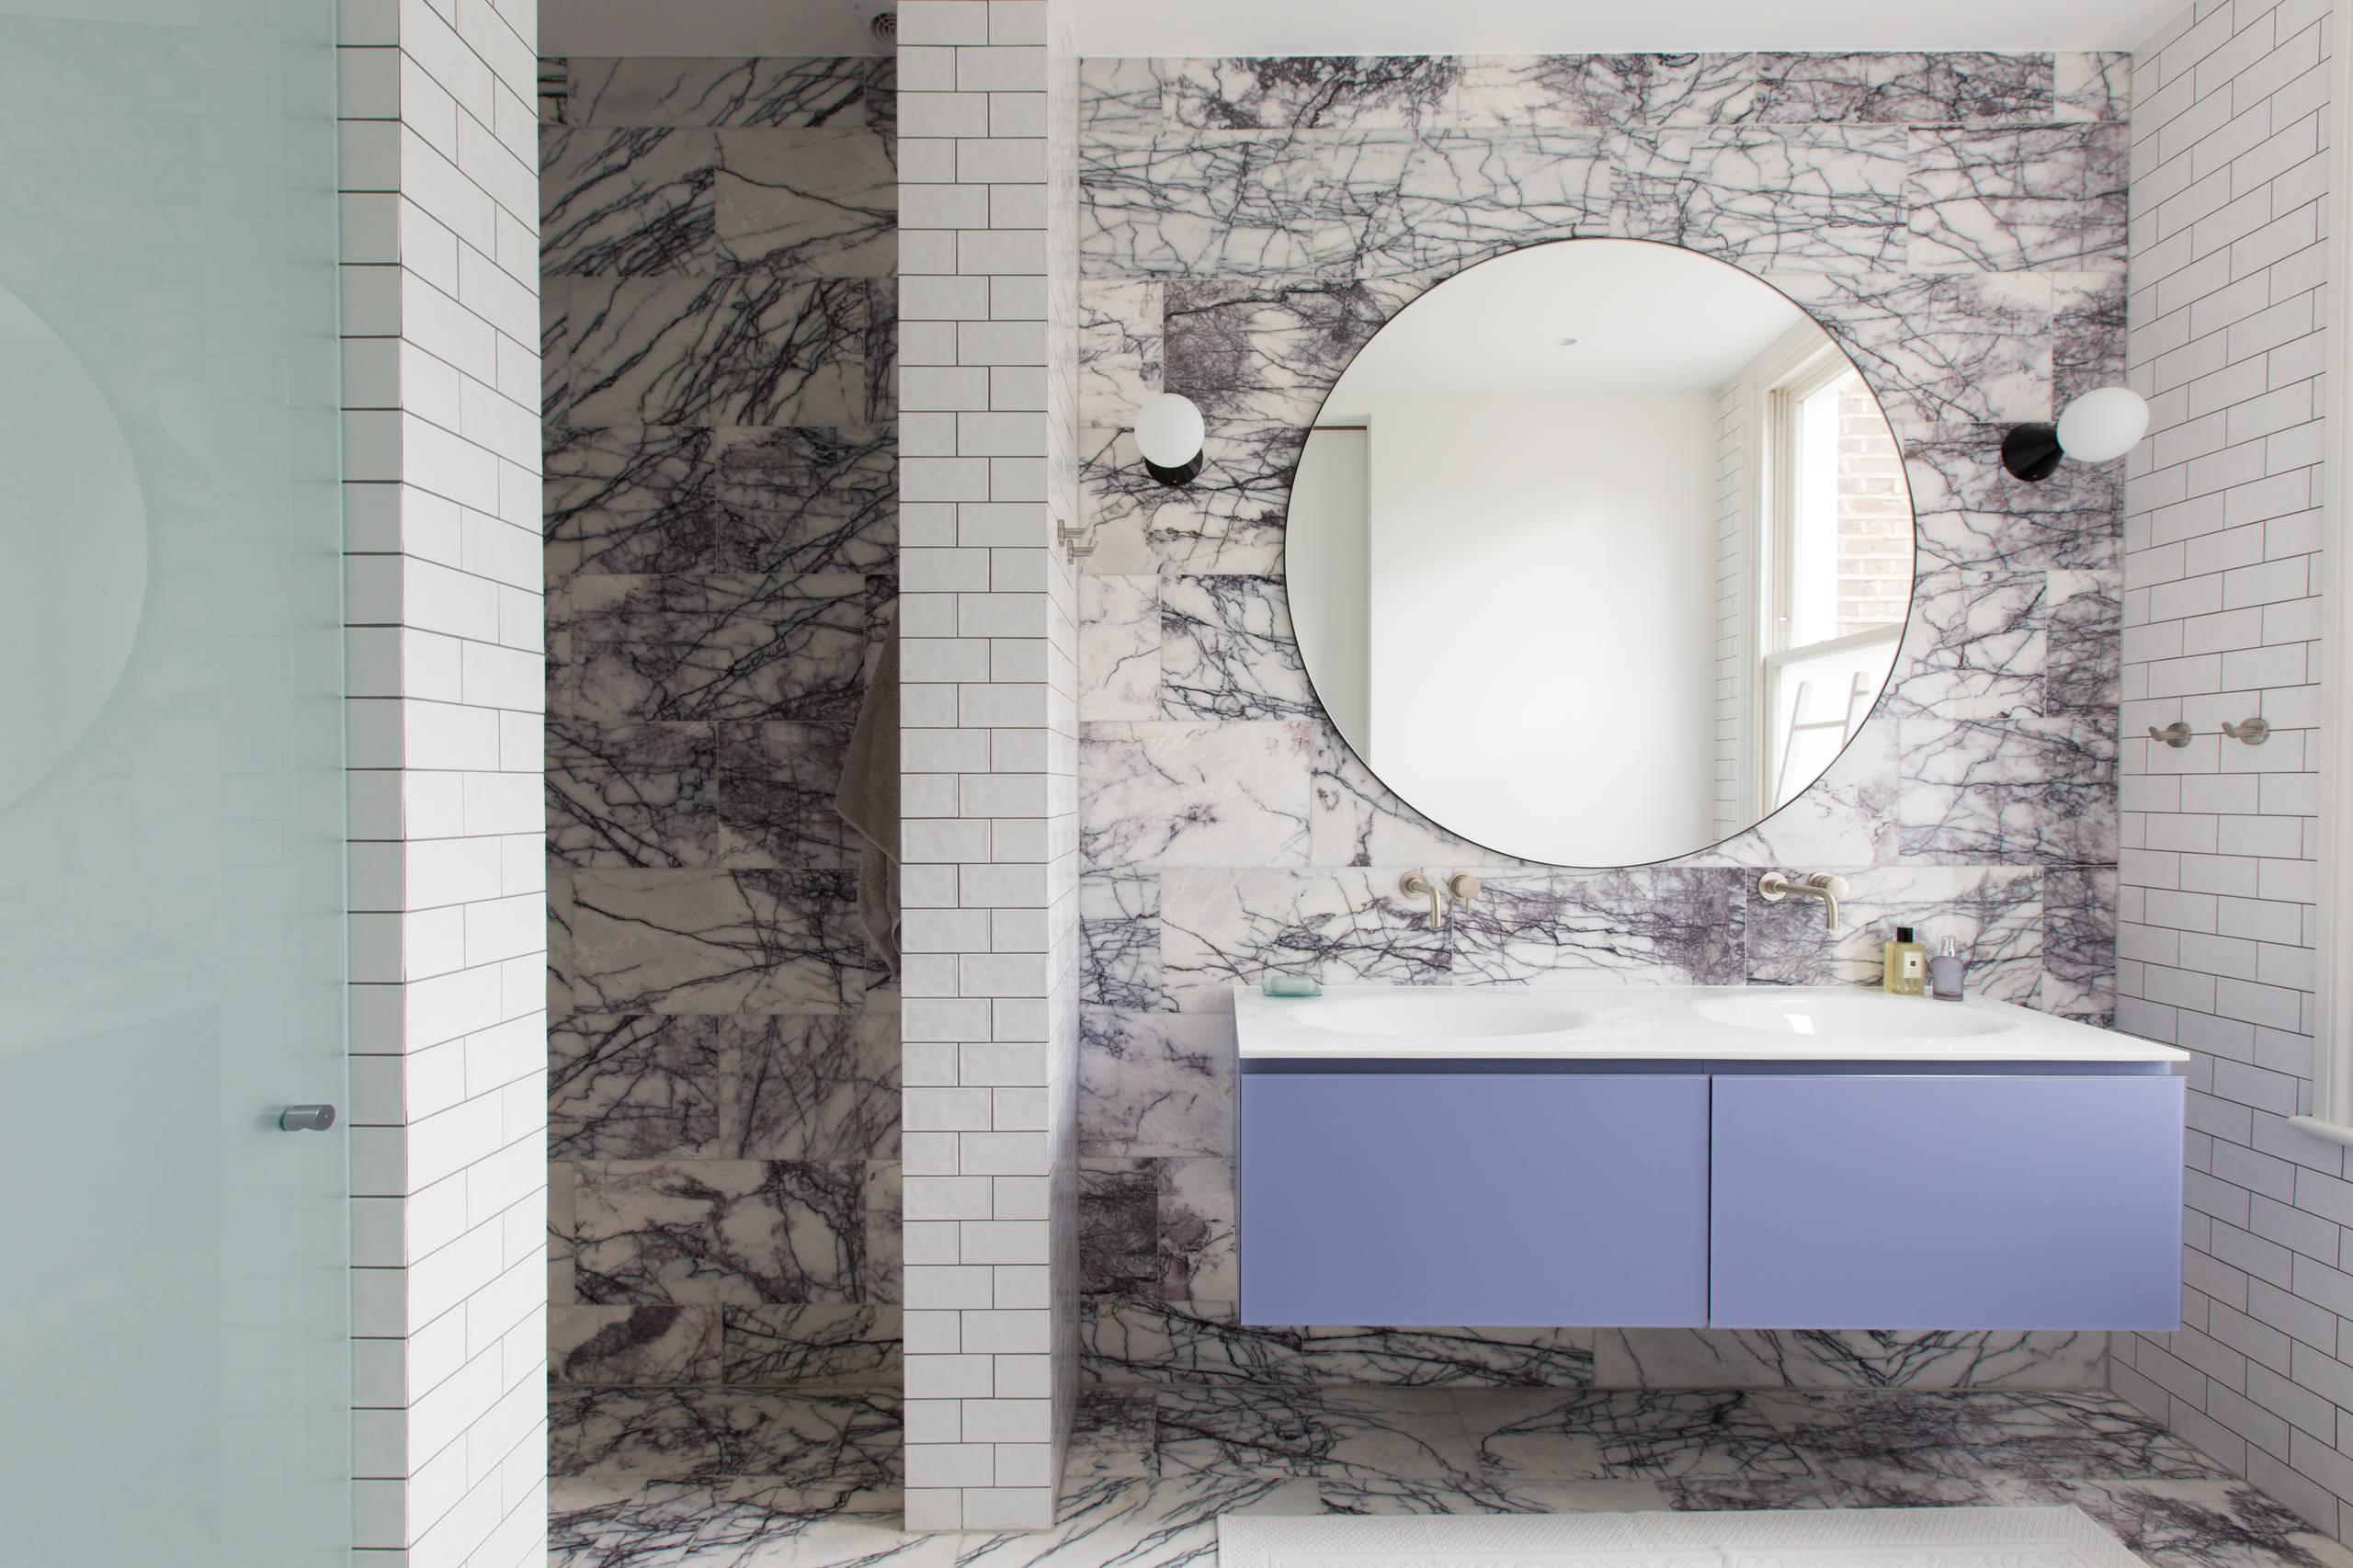 75 Beautiful Purple Marble Floor Bathroom Pictures Ideas December 2020 Houzz